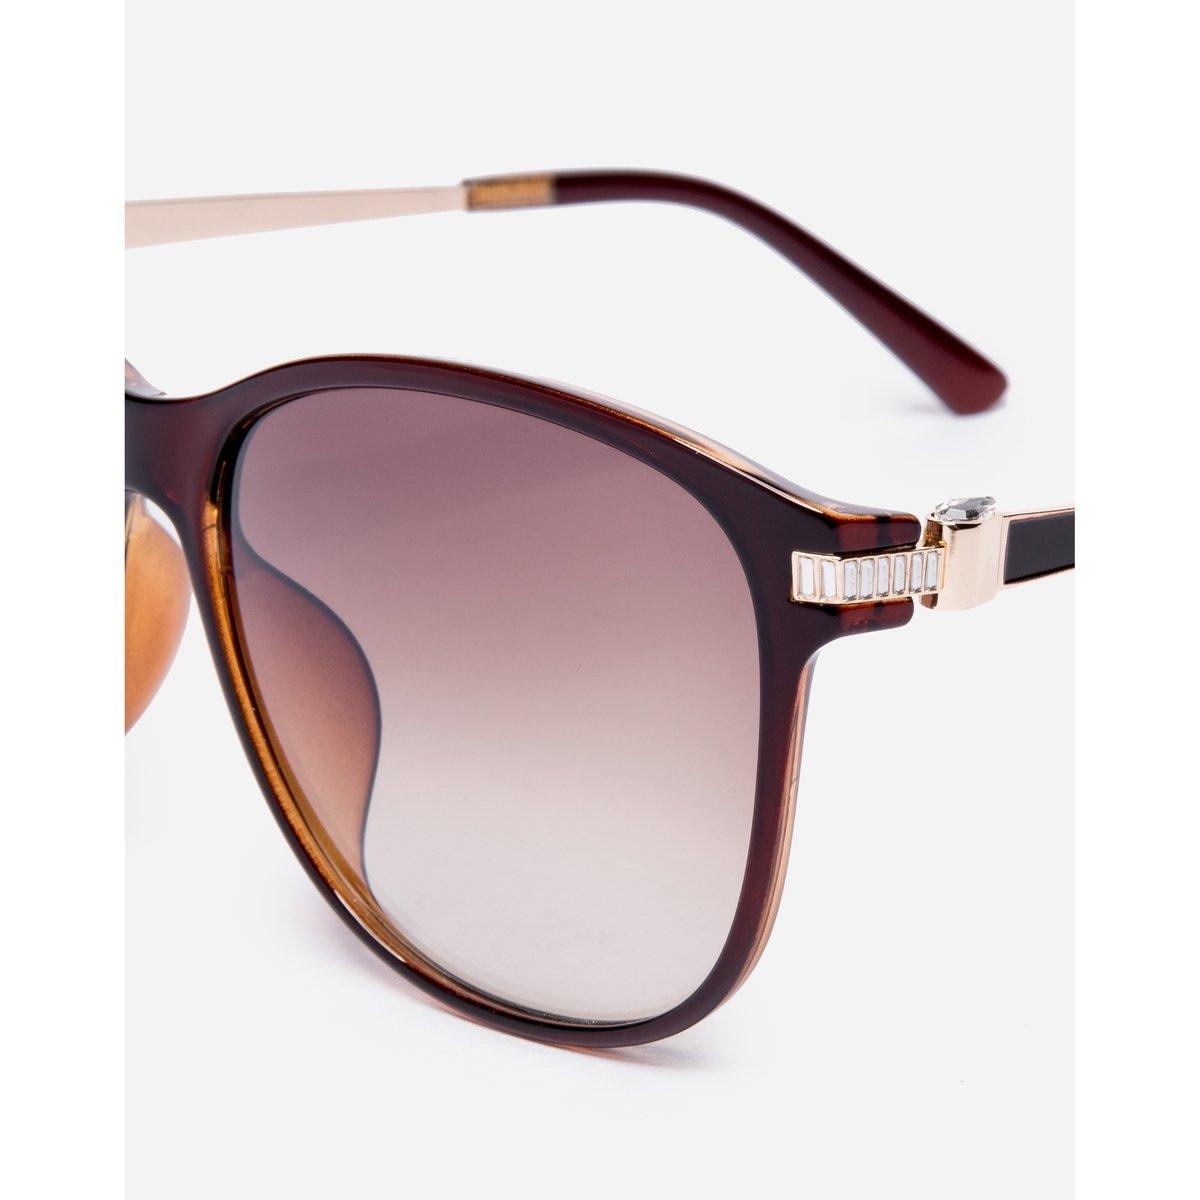 óculos Amaro De Sol D-frame Tortoise - Compre Agora   Zattini 4a52b0aba2